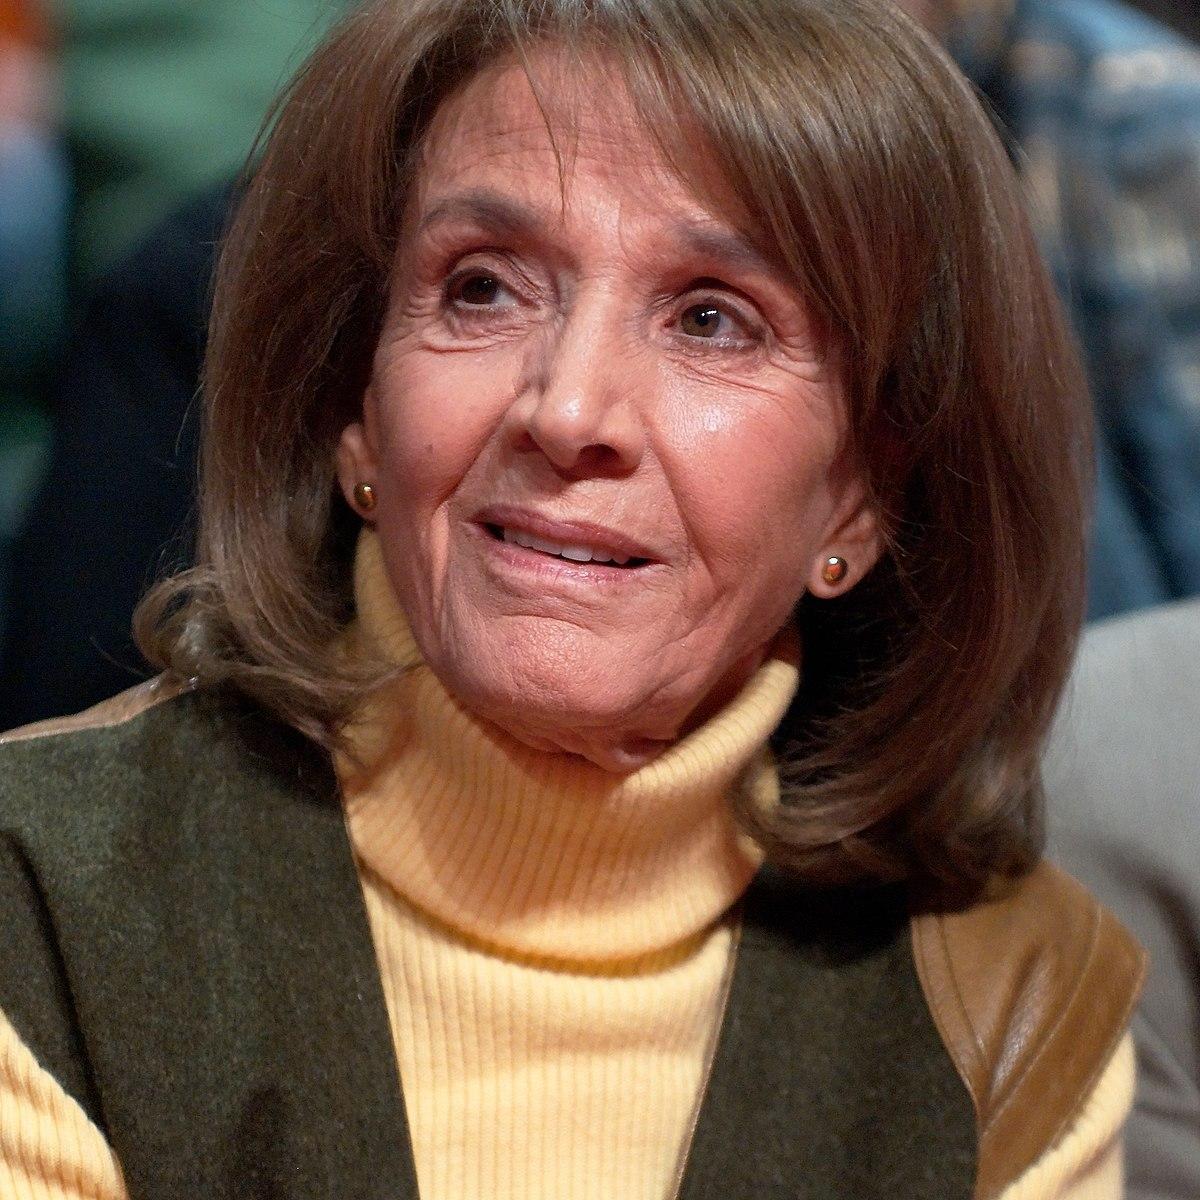 Mélanie Domergue Gisèle Halimi